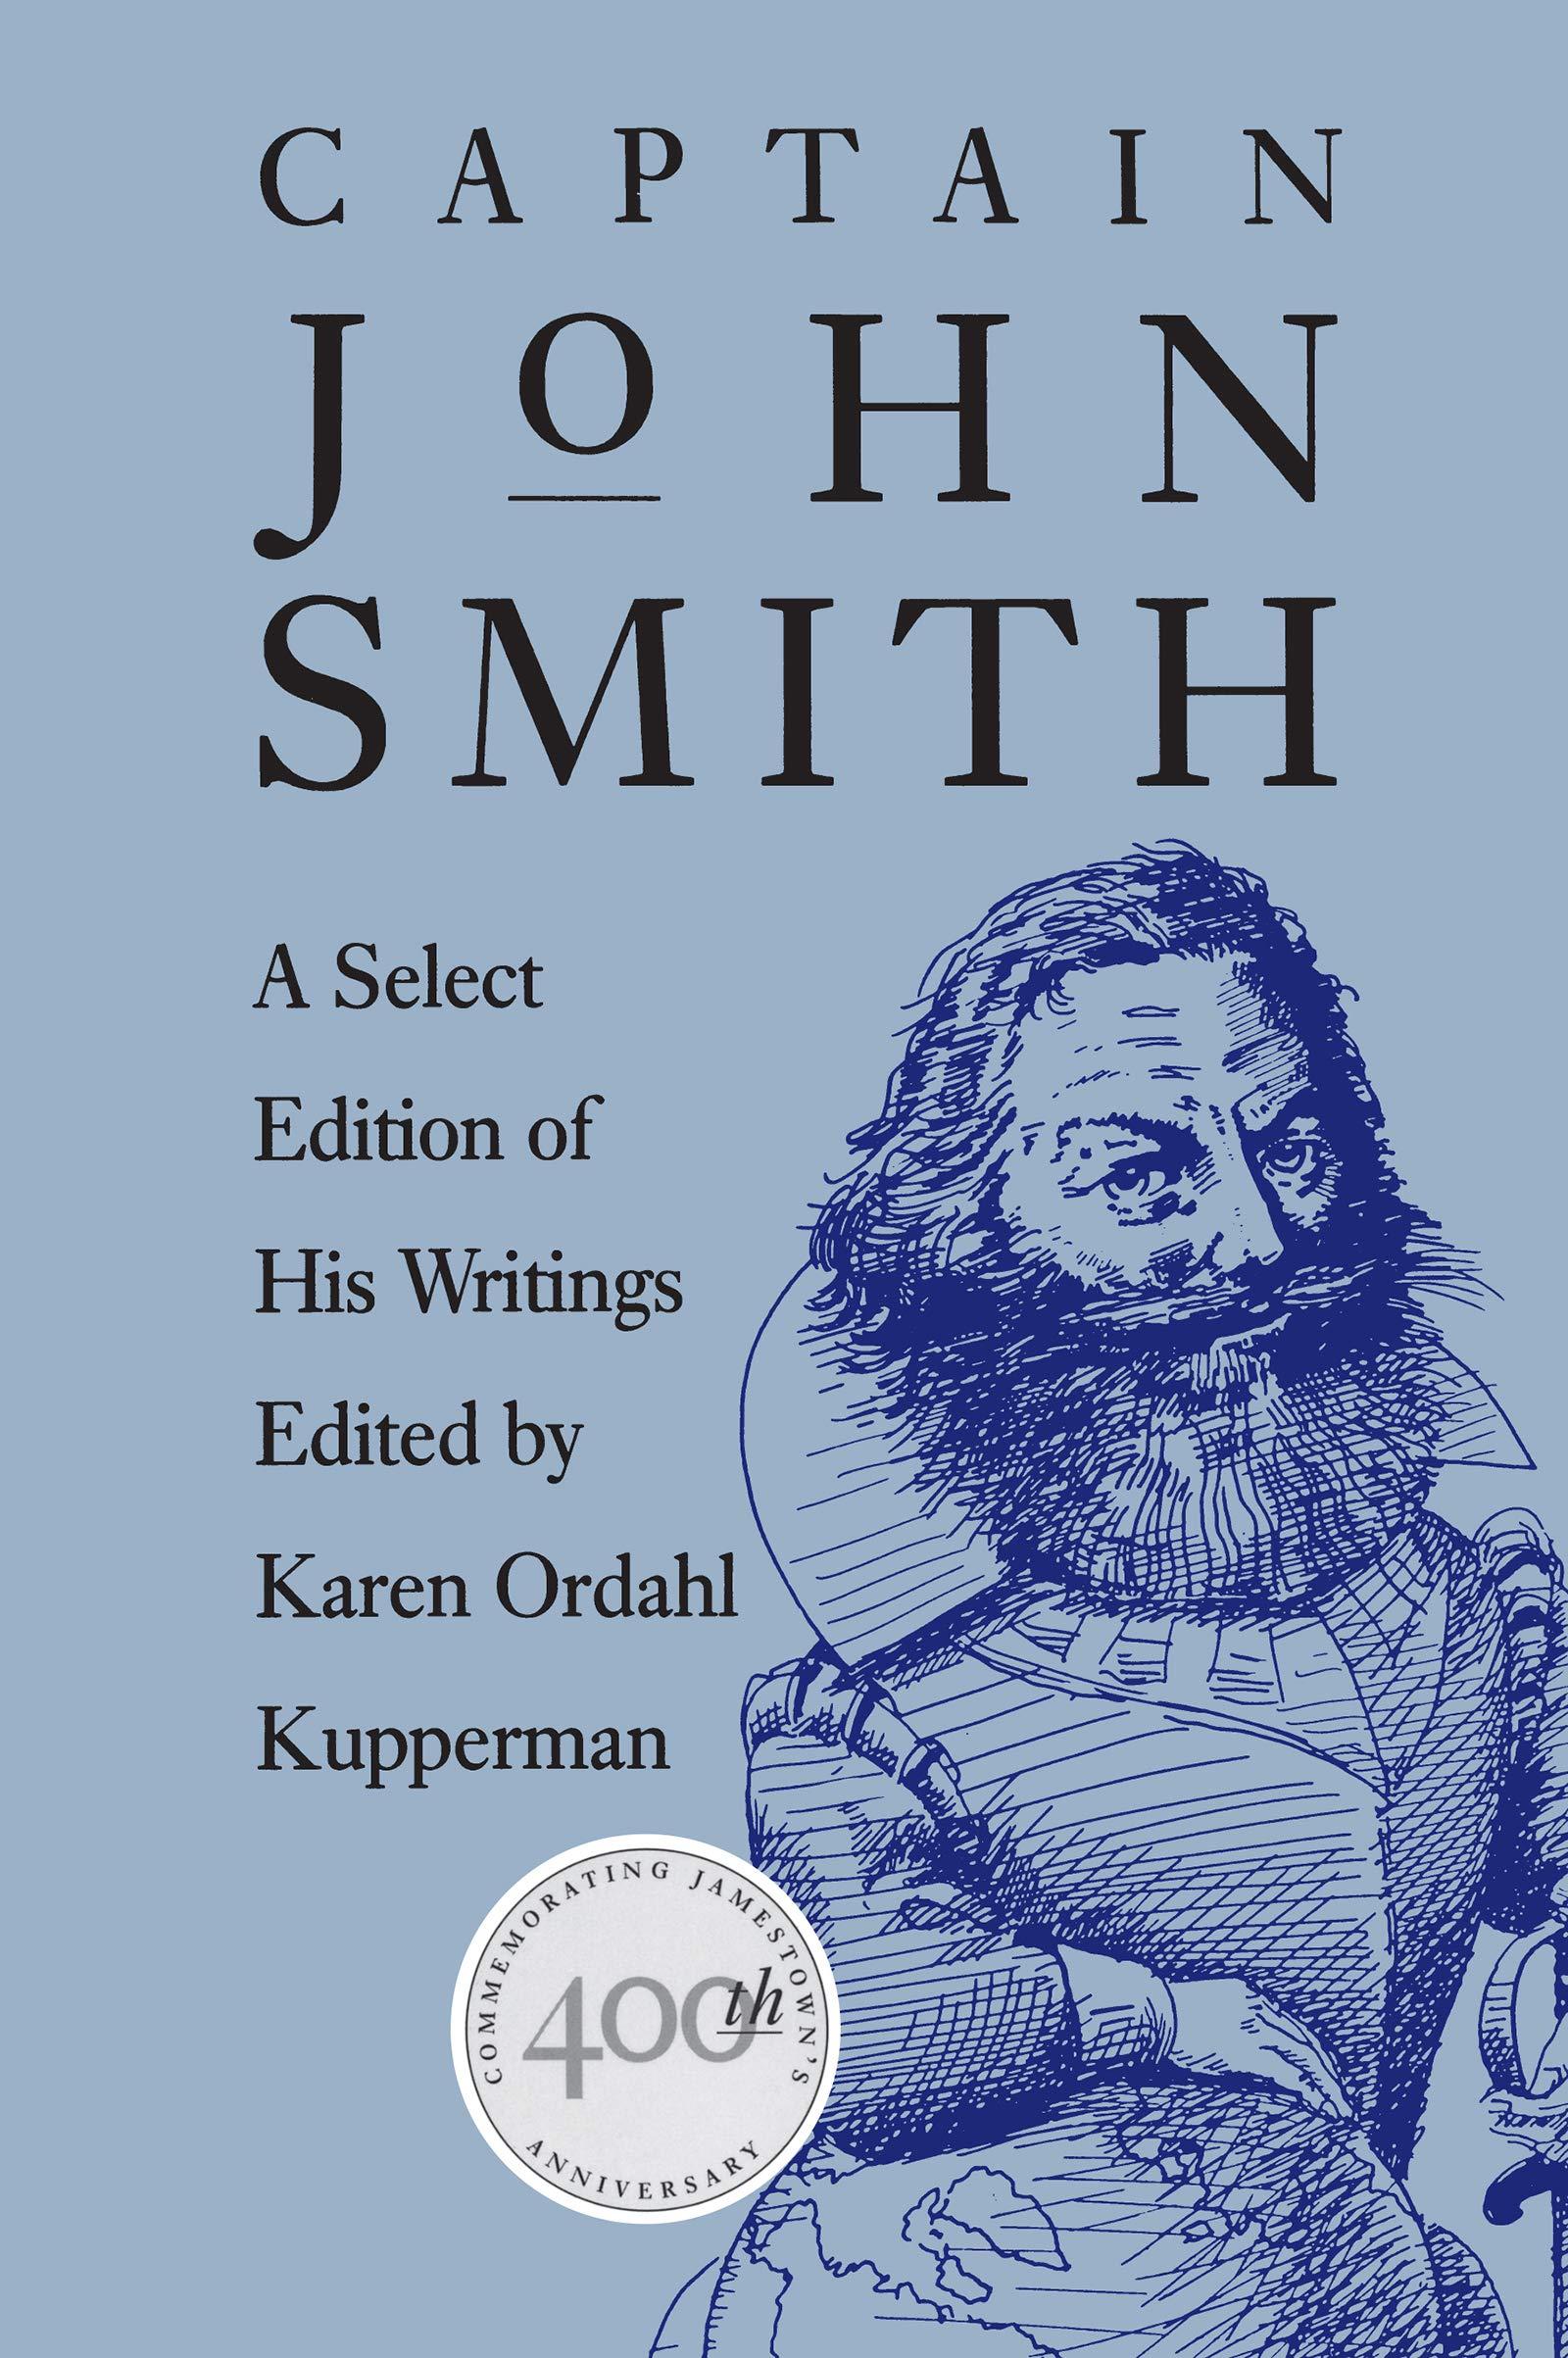 Captain John Smith: A Select Edition of His Writings